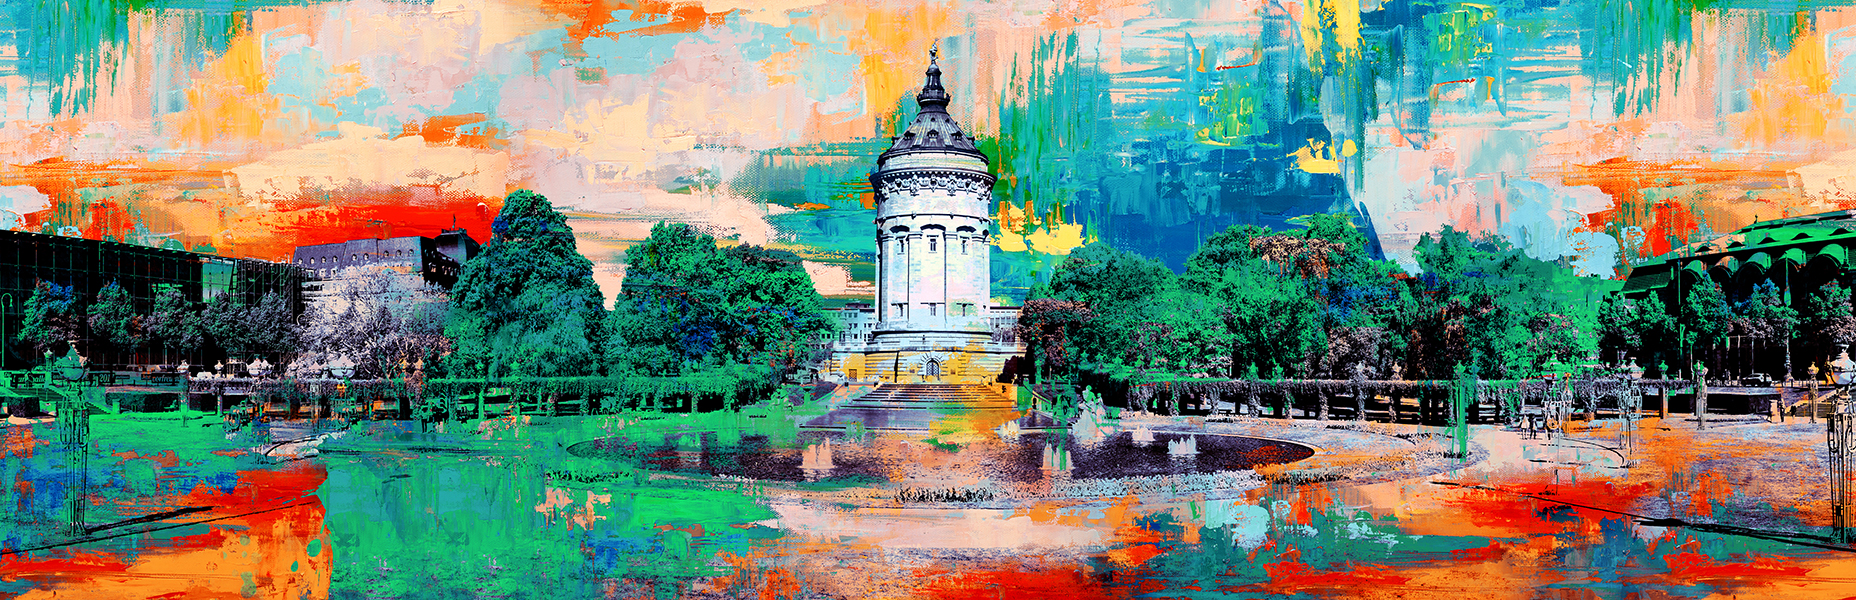 Mannheim Wasserturm - Format 180 x 60 cm